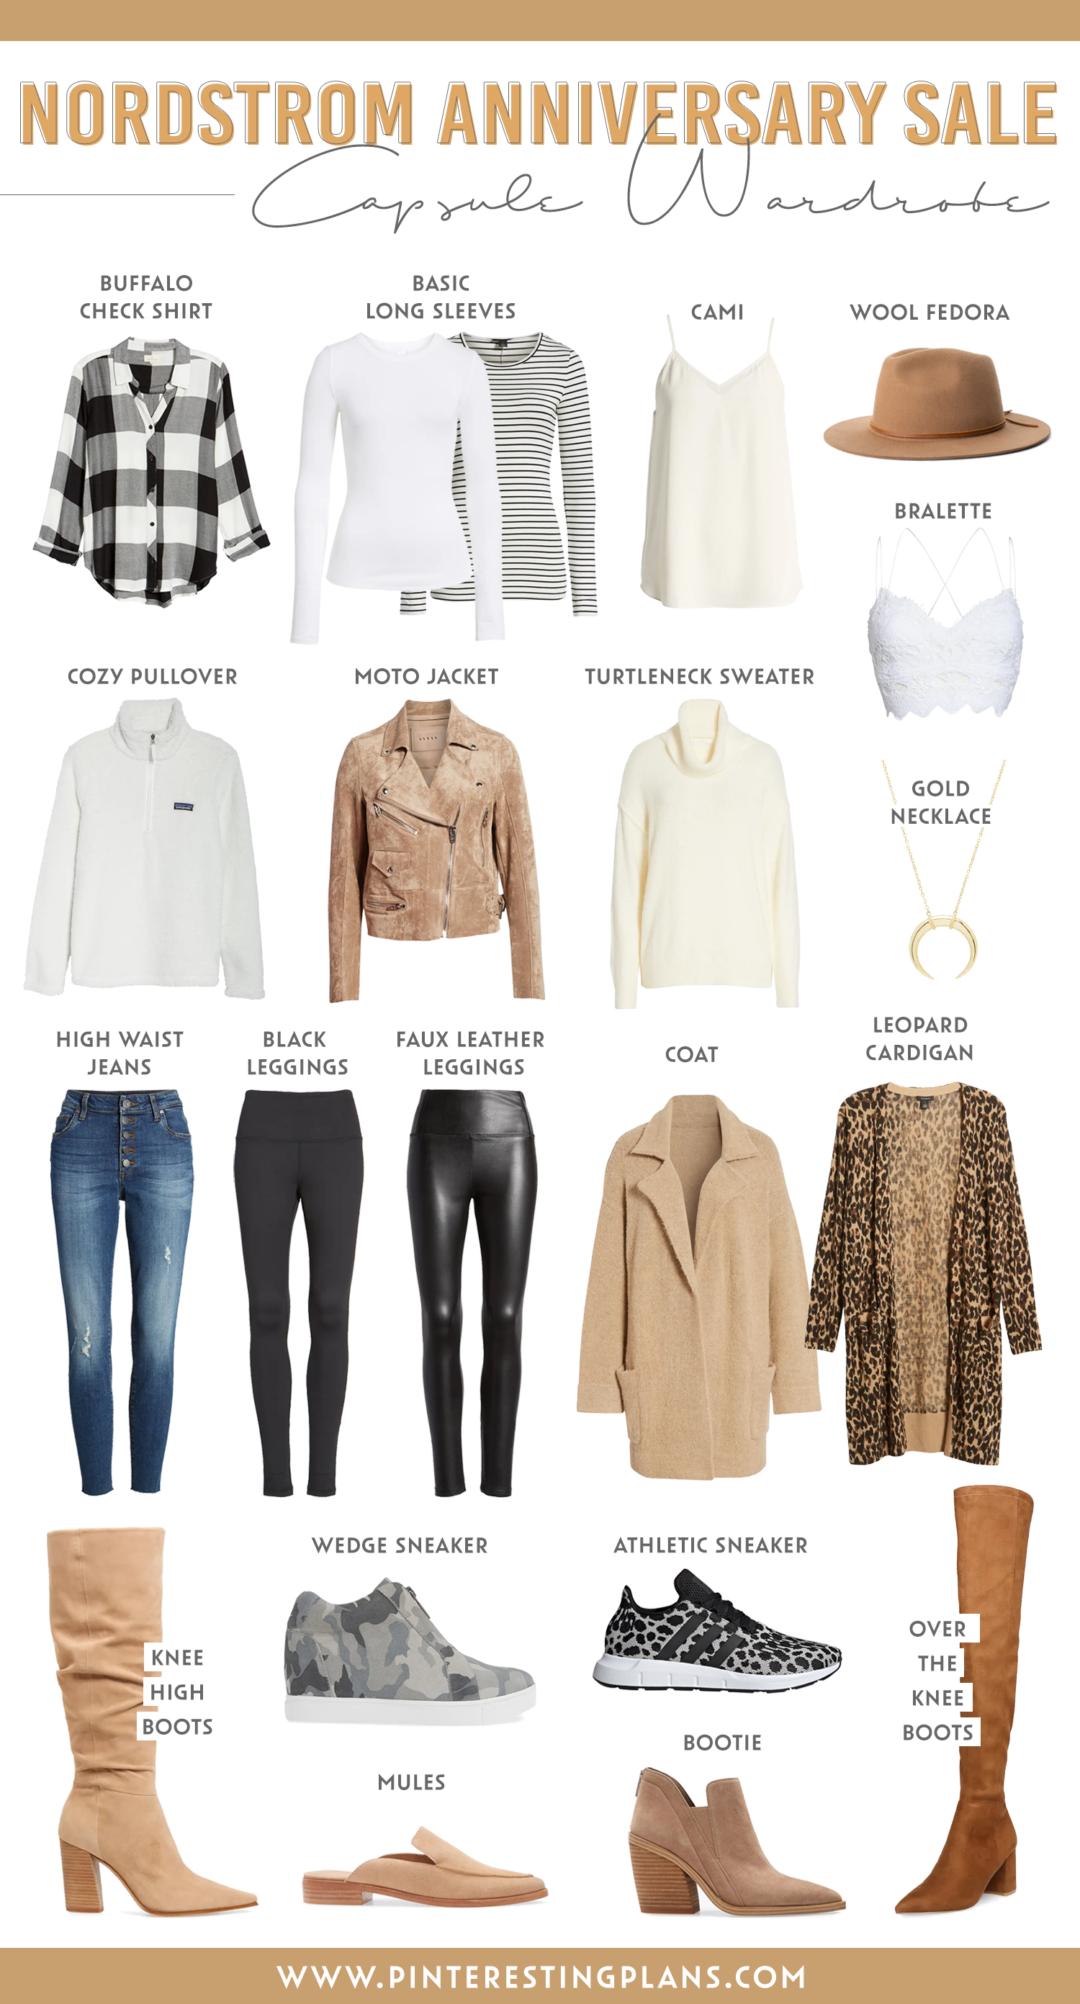 nordstrom anniversary sale fall capsule wardrobe 2020 on pinteresting plans fashion blog